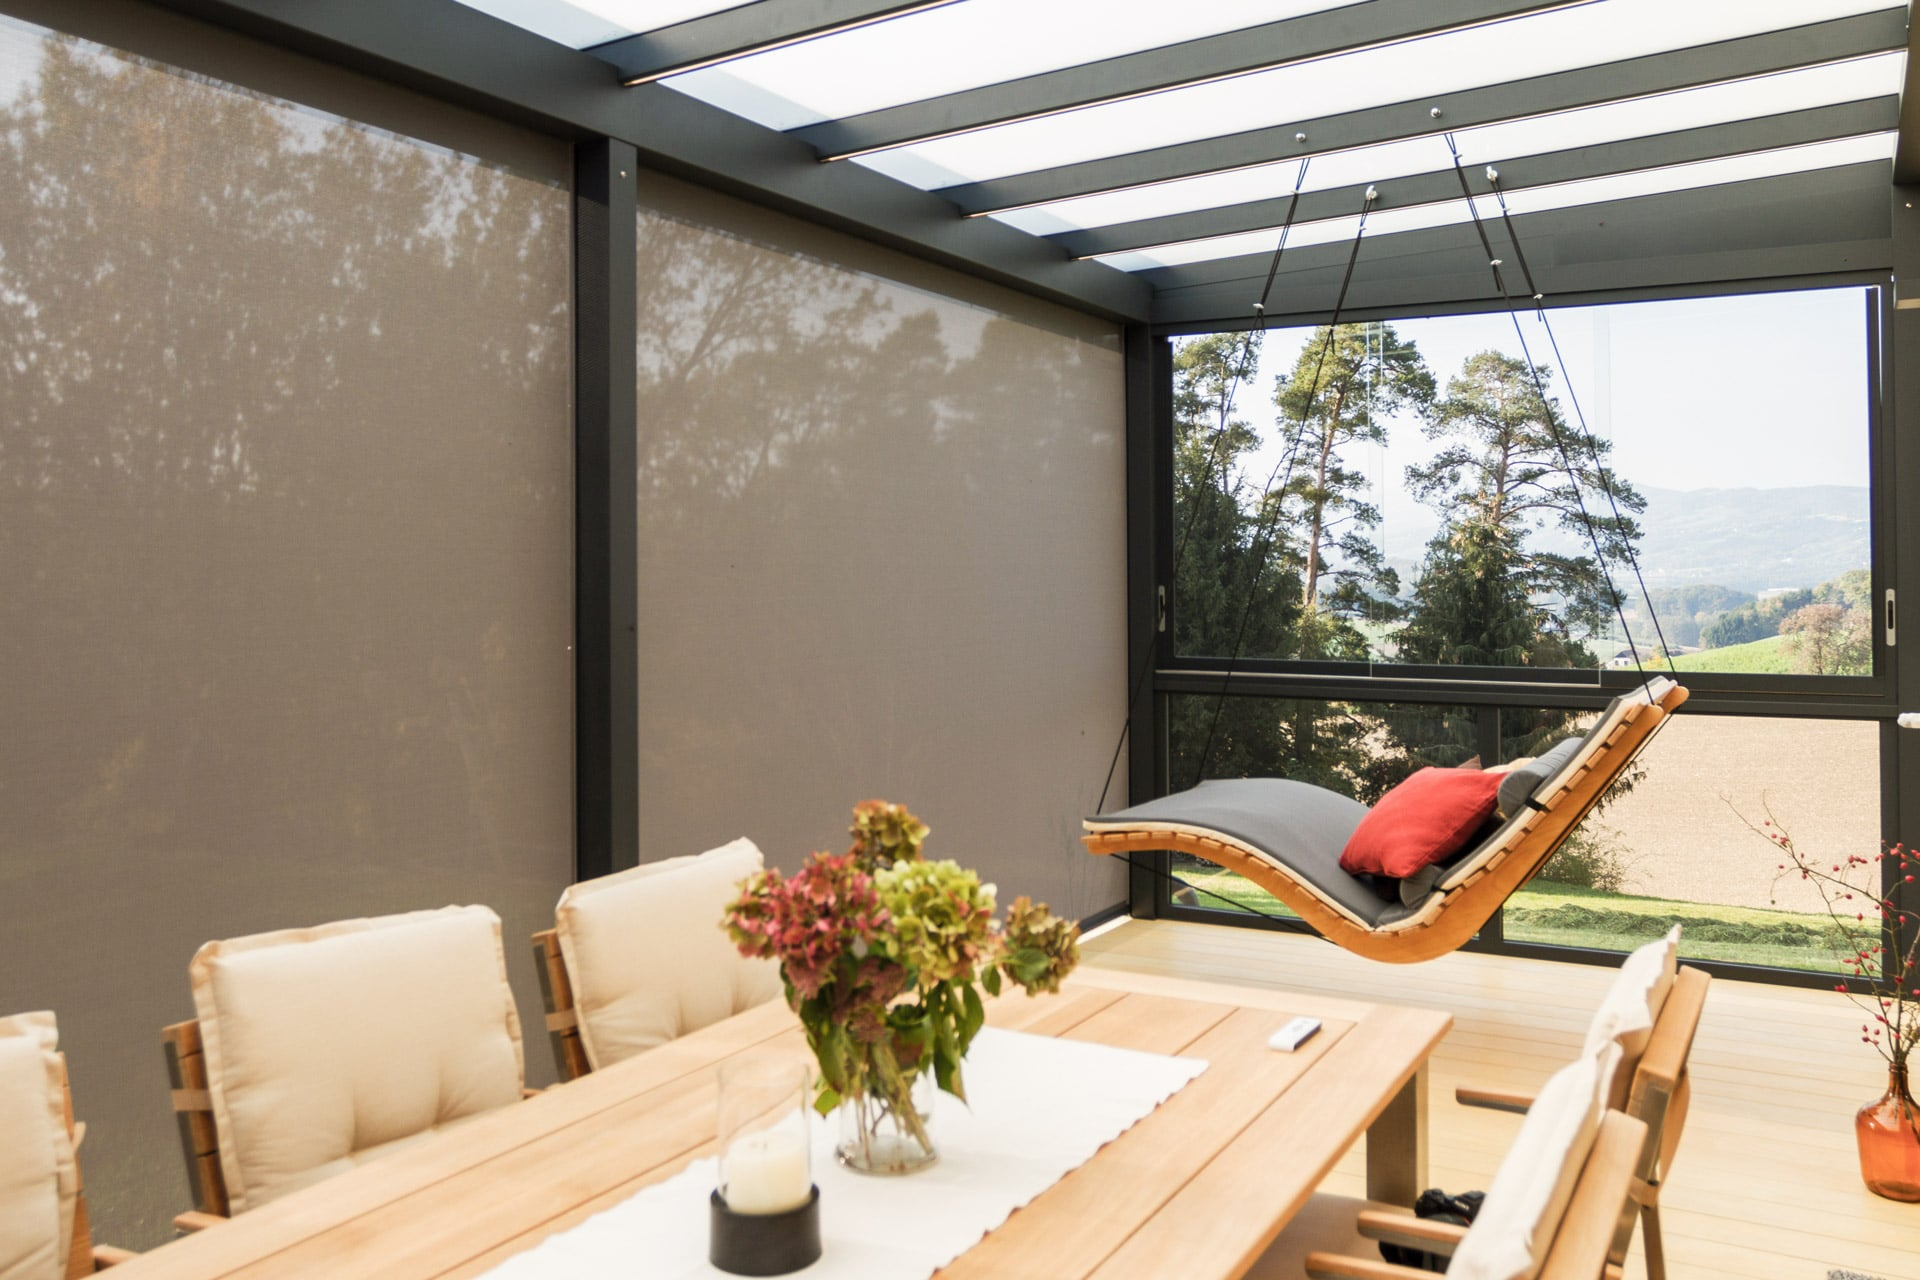 Z 10 b | Senkrecht-Markise bei Alu-Dach als Sonnenschutz, Blendschutz, leichter Windschutz | Svoboda